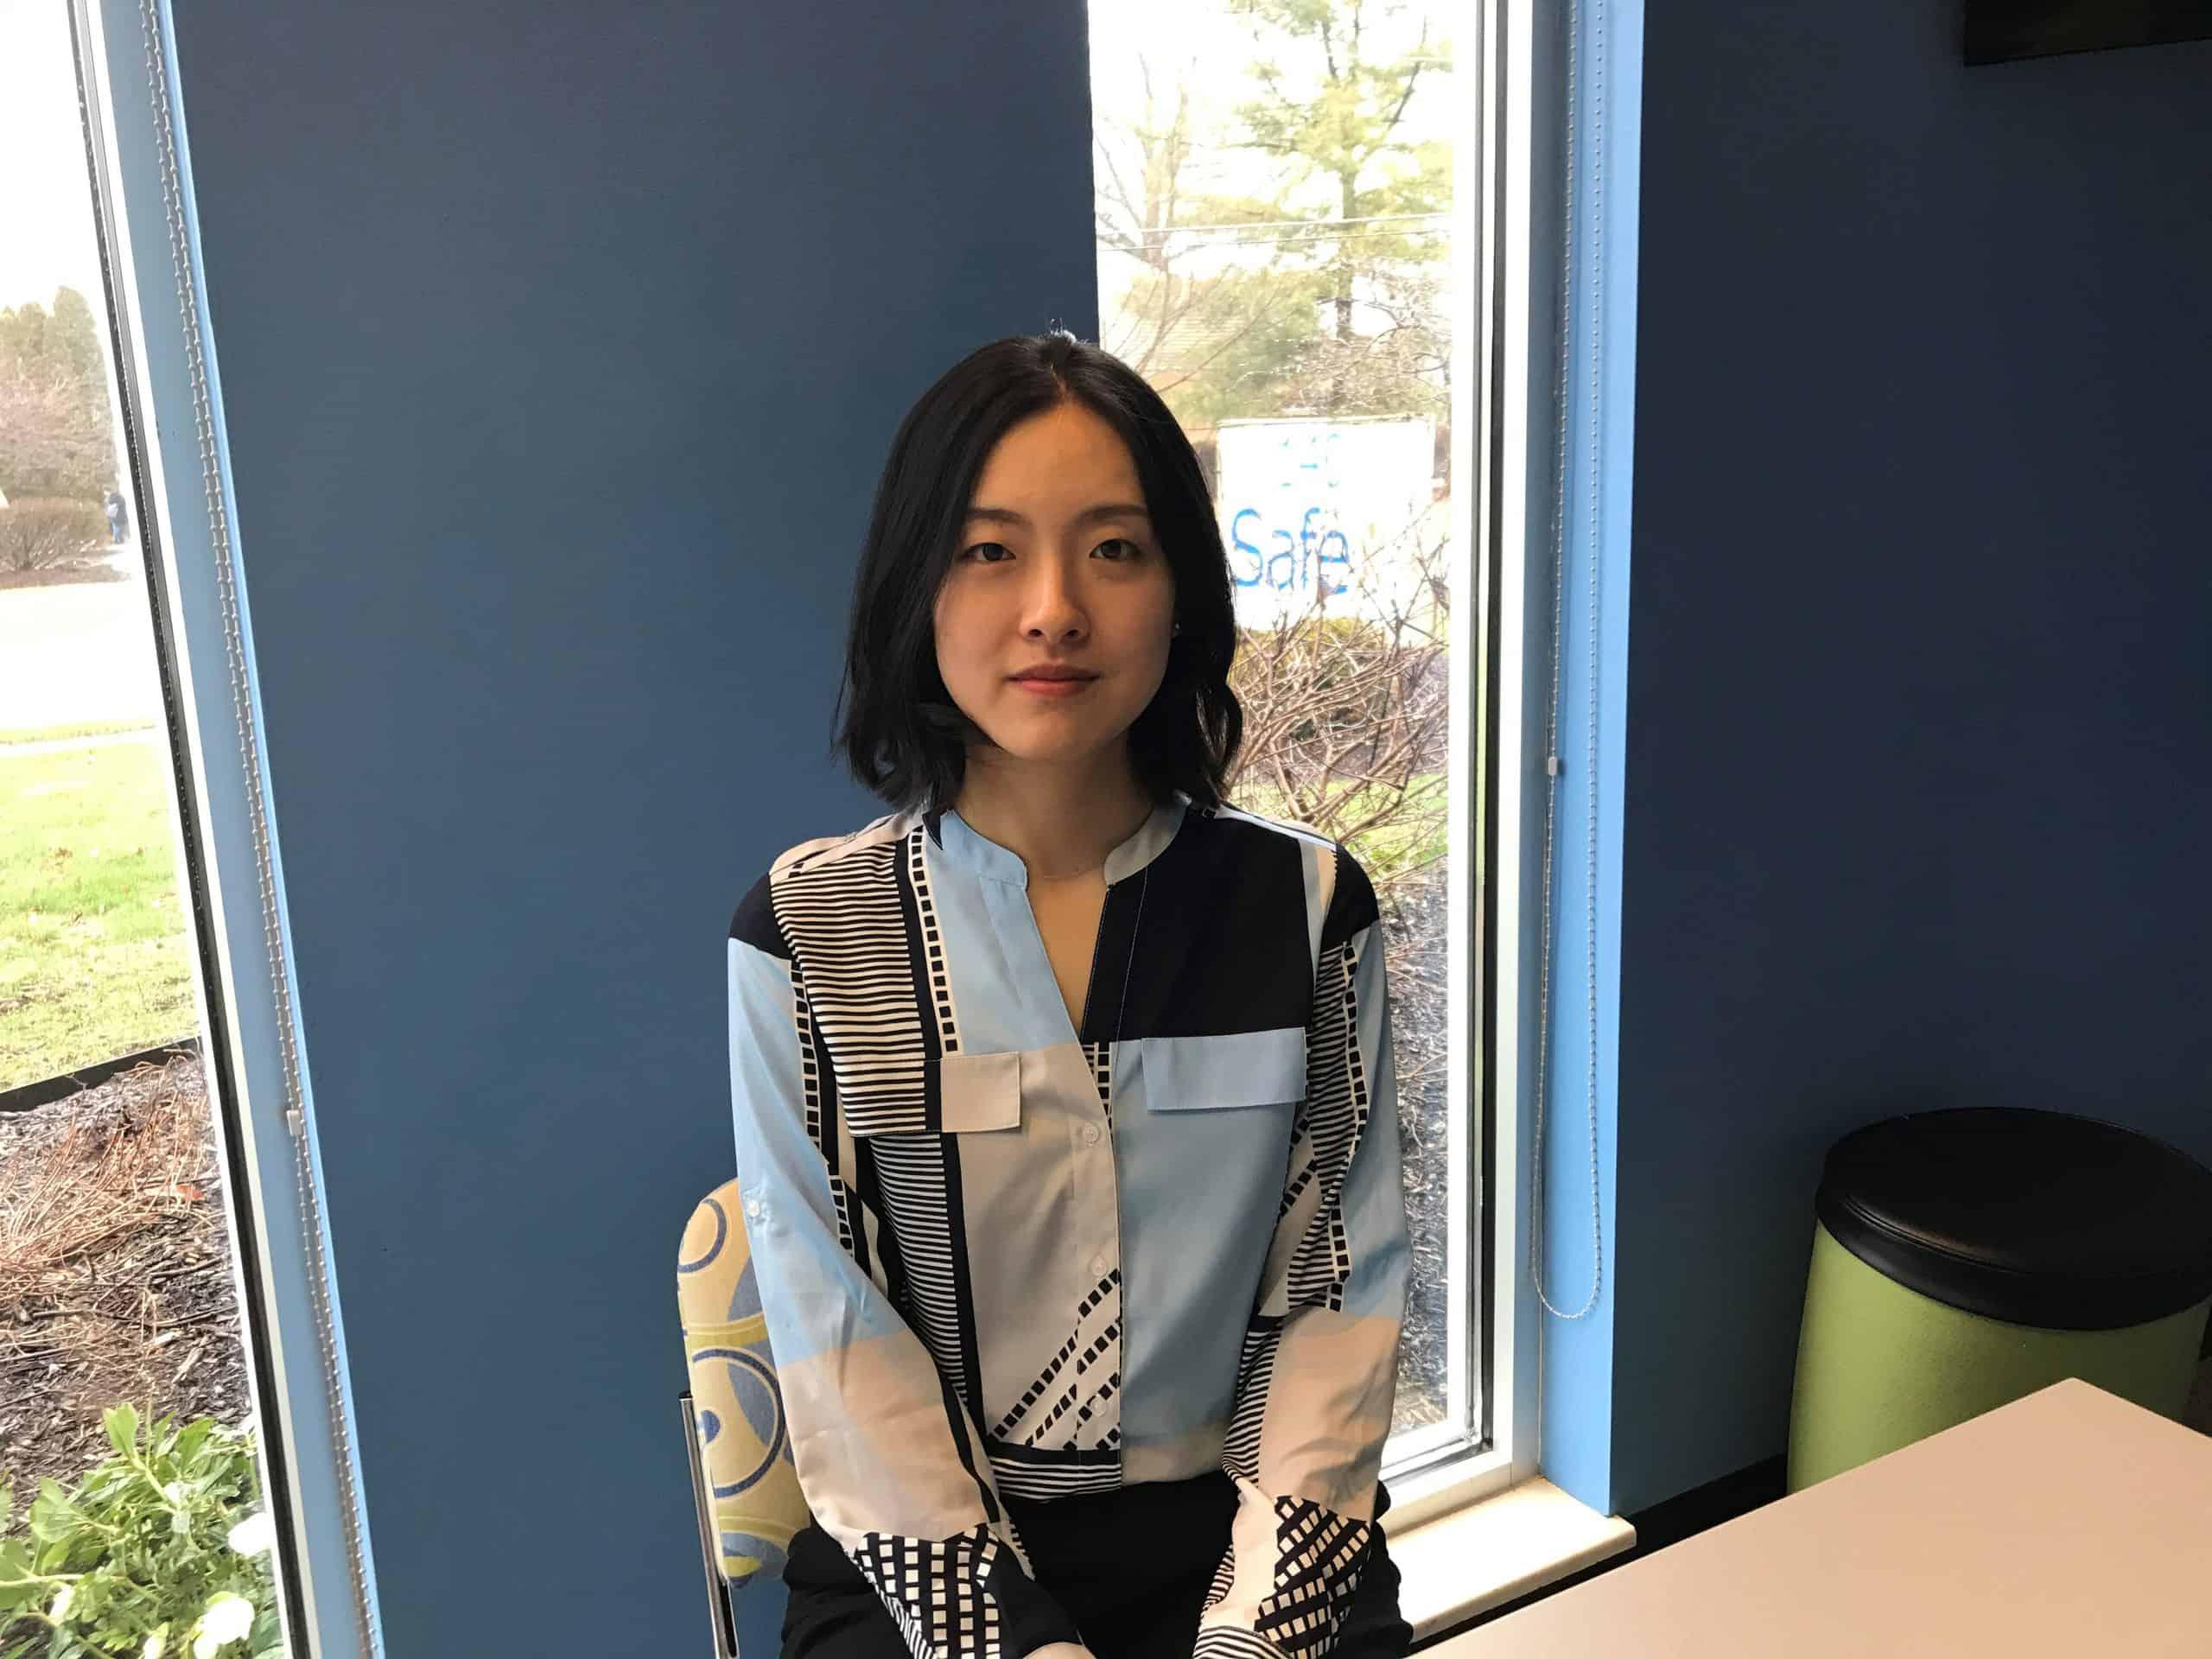 Irene Wang, Industrial Hygienist